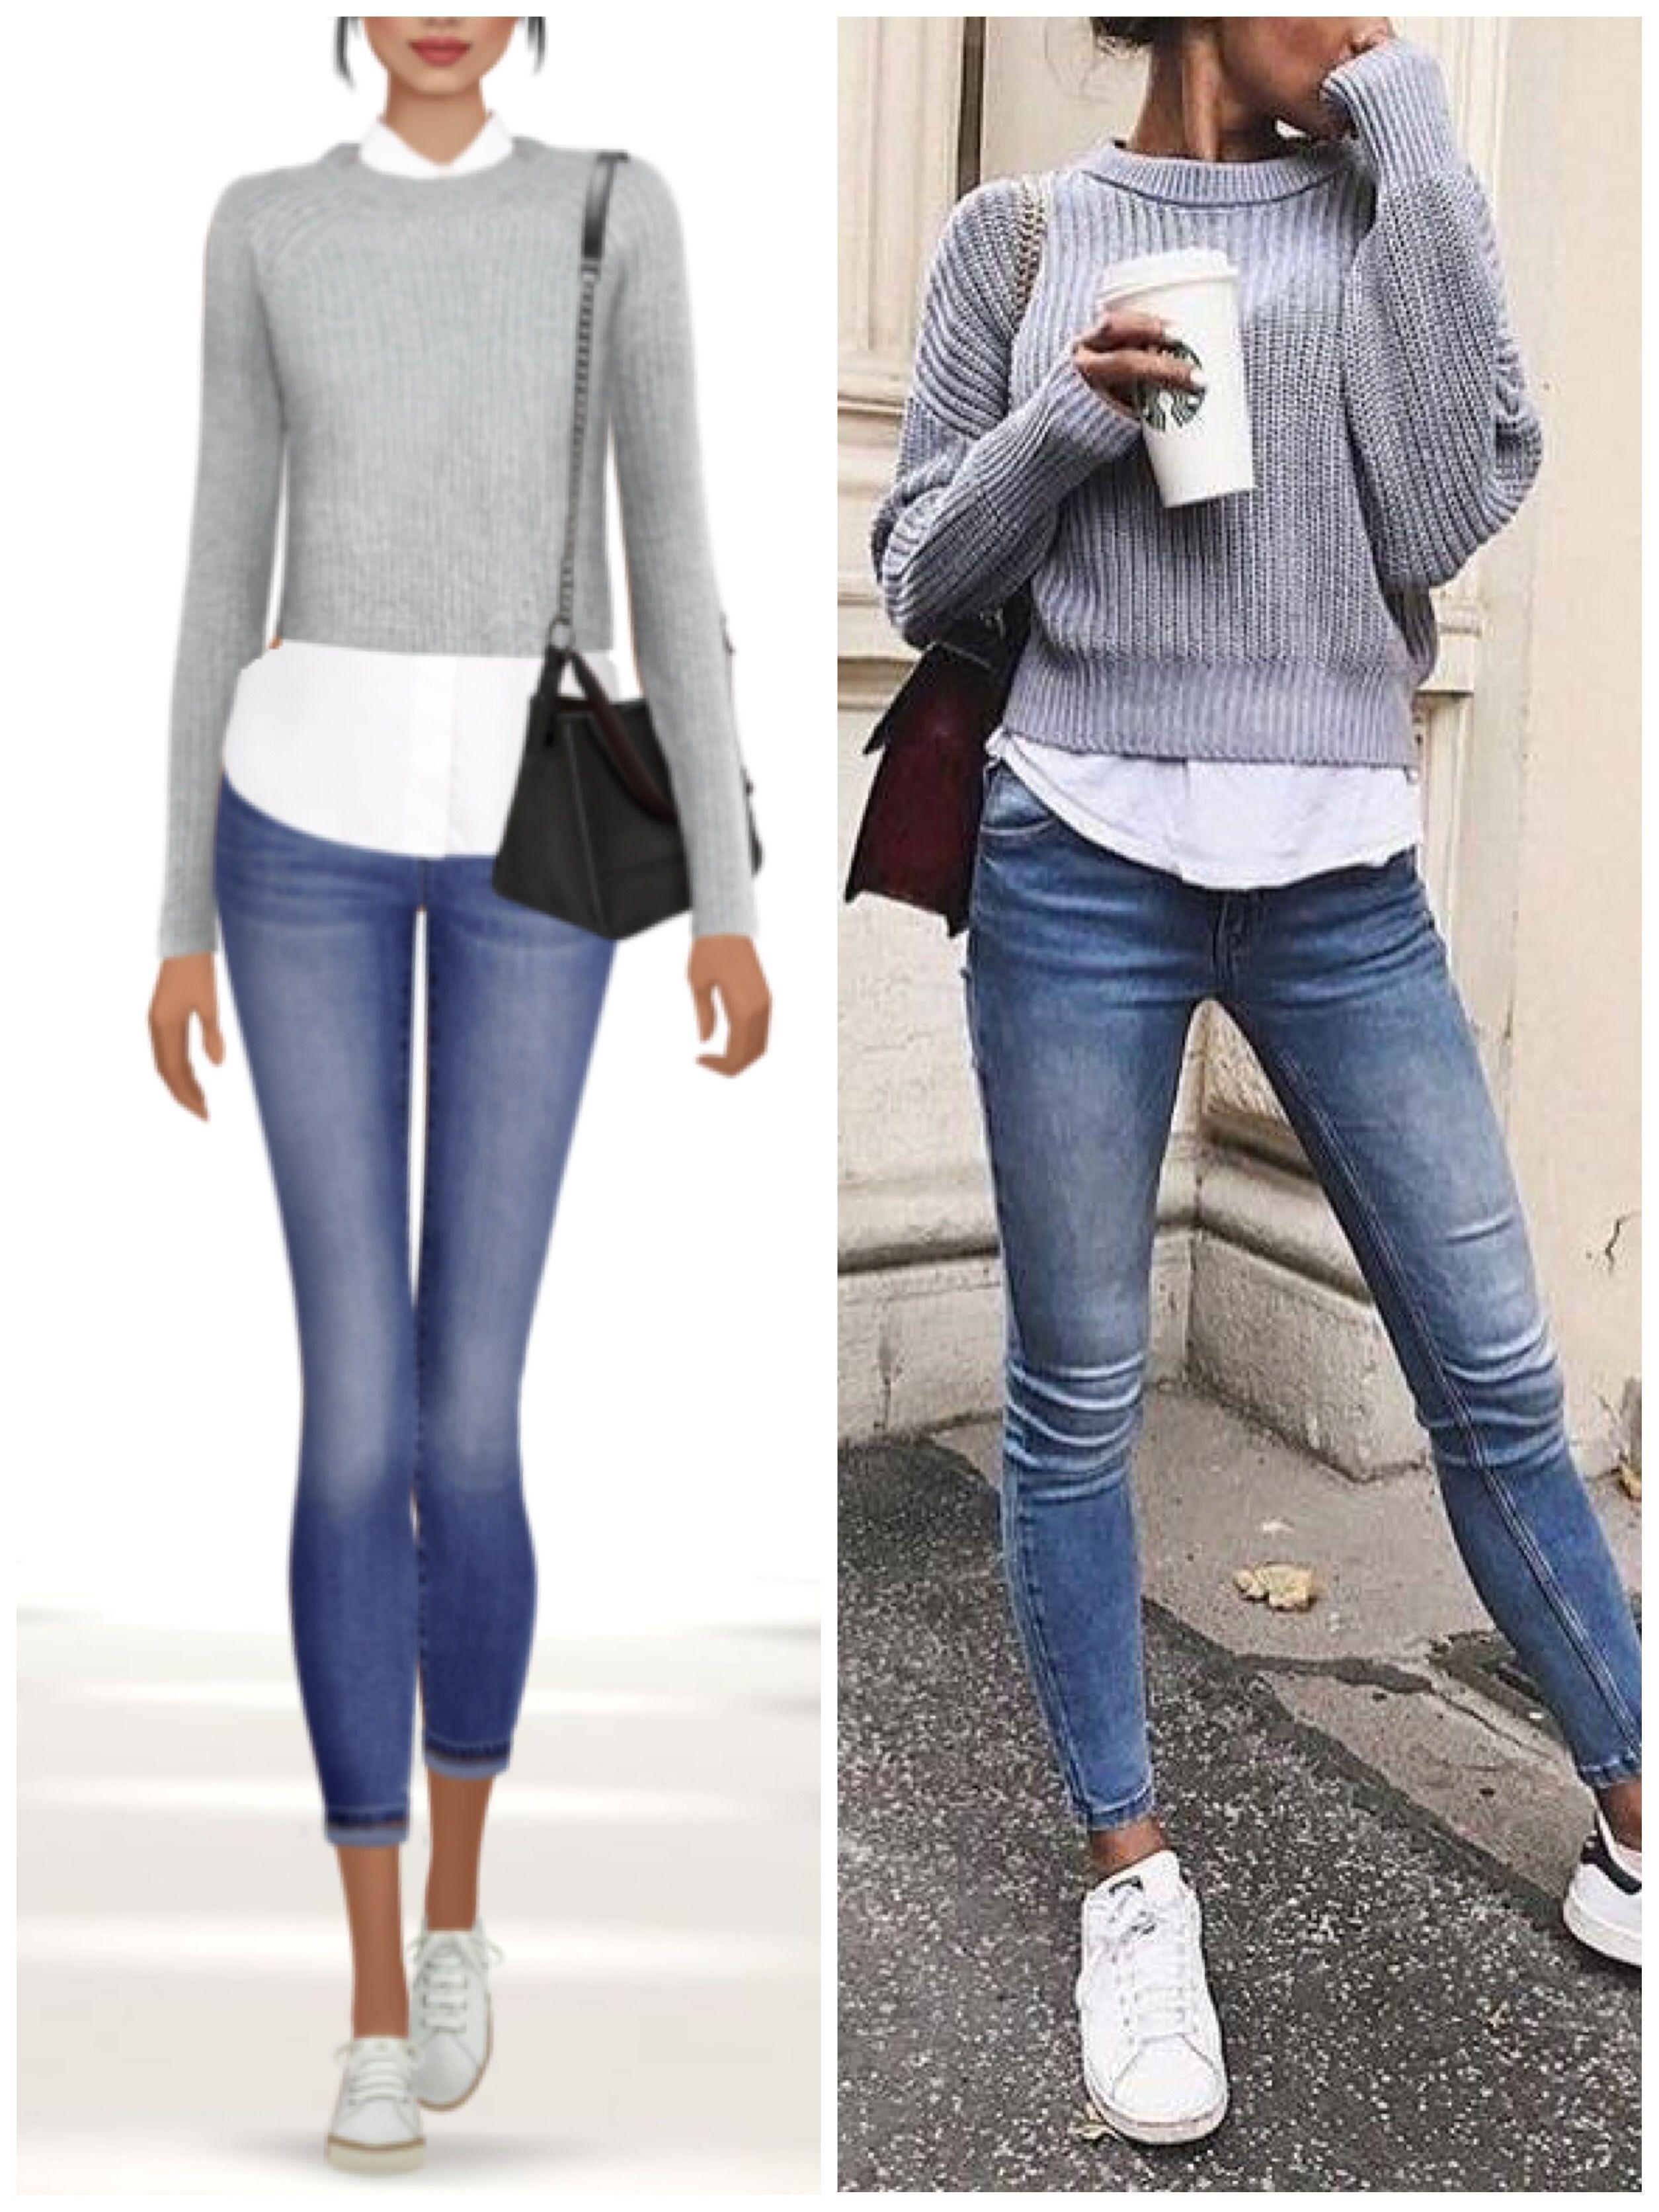 Moda in ufficio: Autunno 45+ outfits #Outfits invernali Moda in ufficio: Autunno…